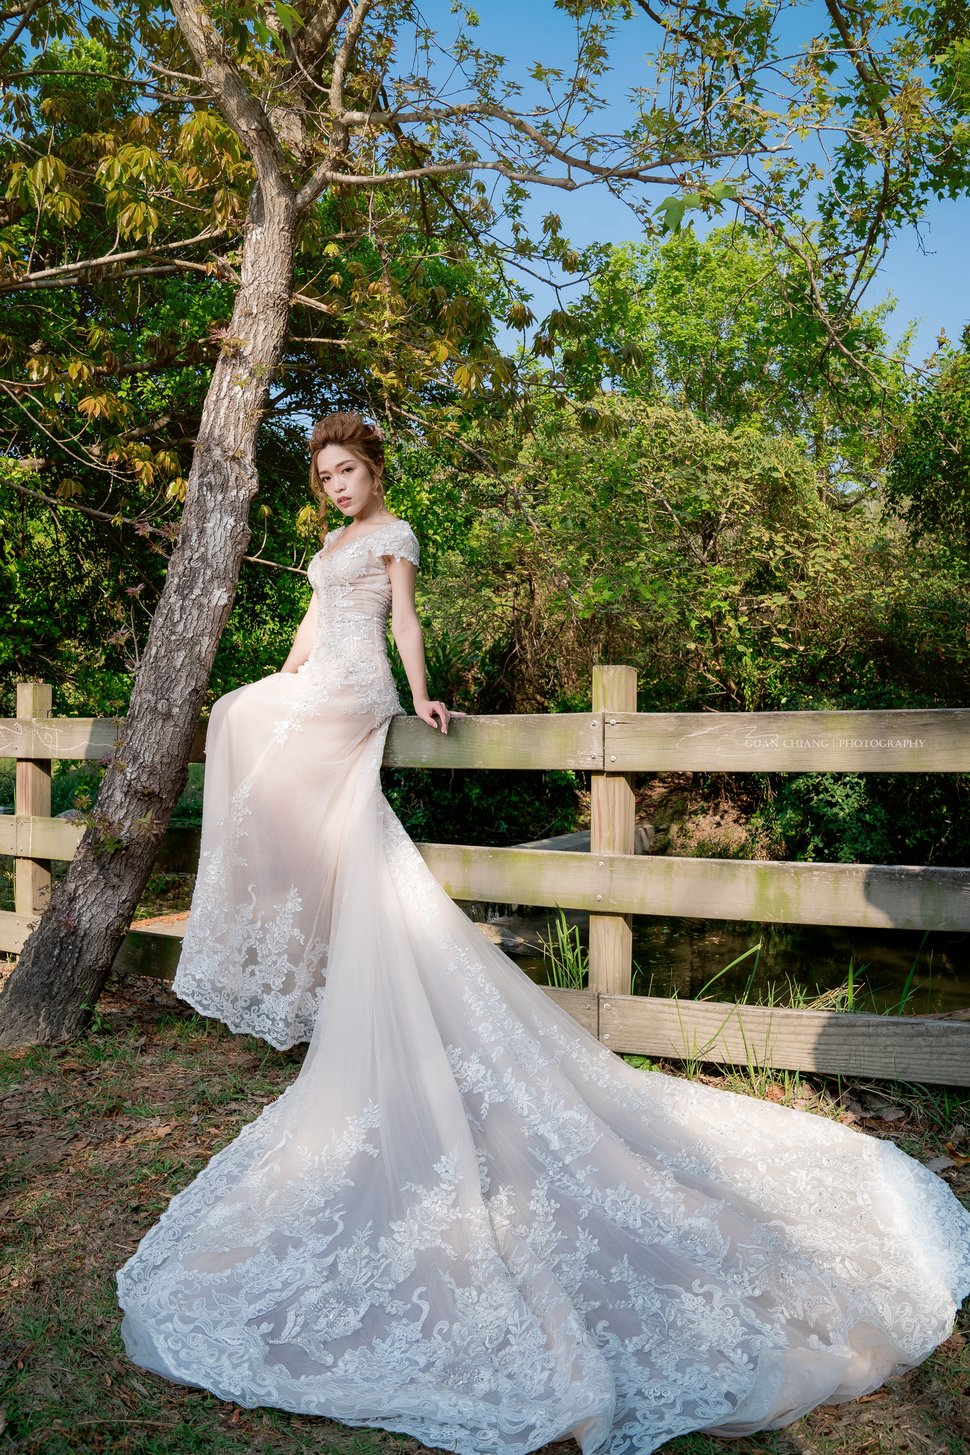 dsc01351-1_39137027480_o - 全台最便宜-45DESIGN四五婚紗禮服《結婚吧》